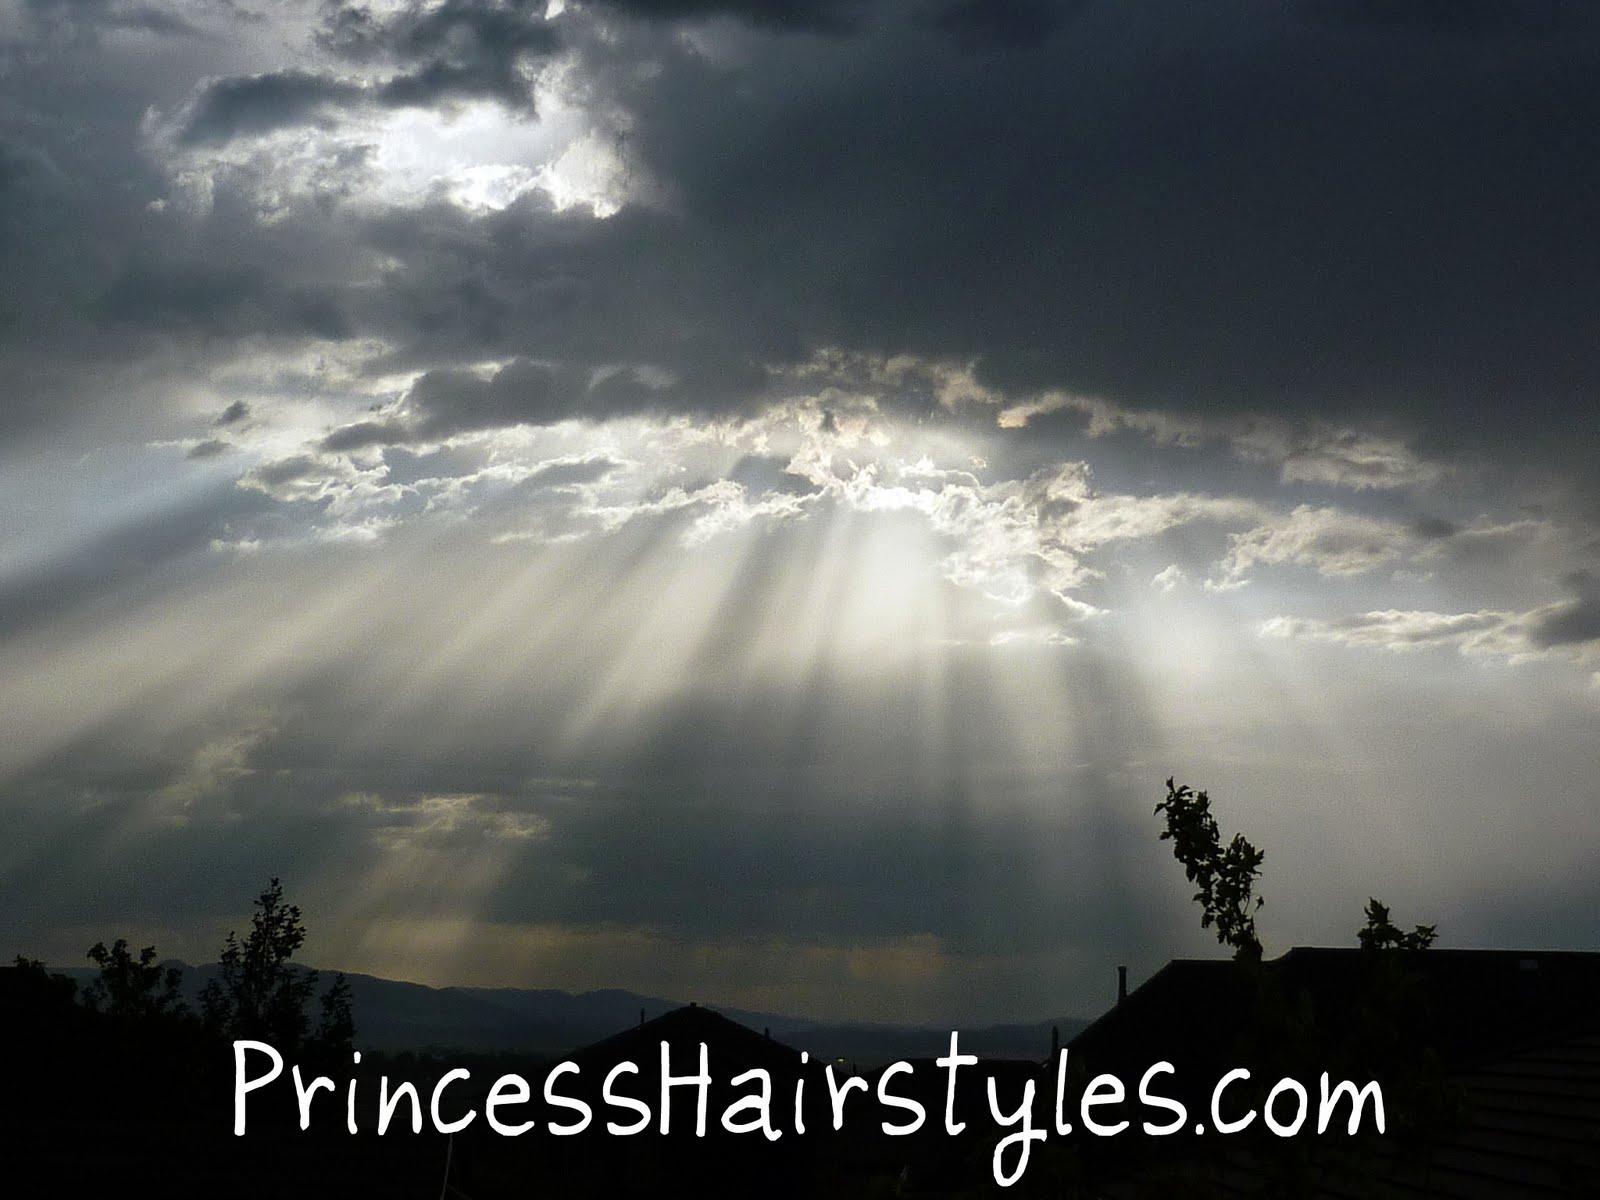 Princess Style Headband - With Rays Of Sunshine